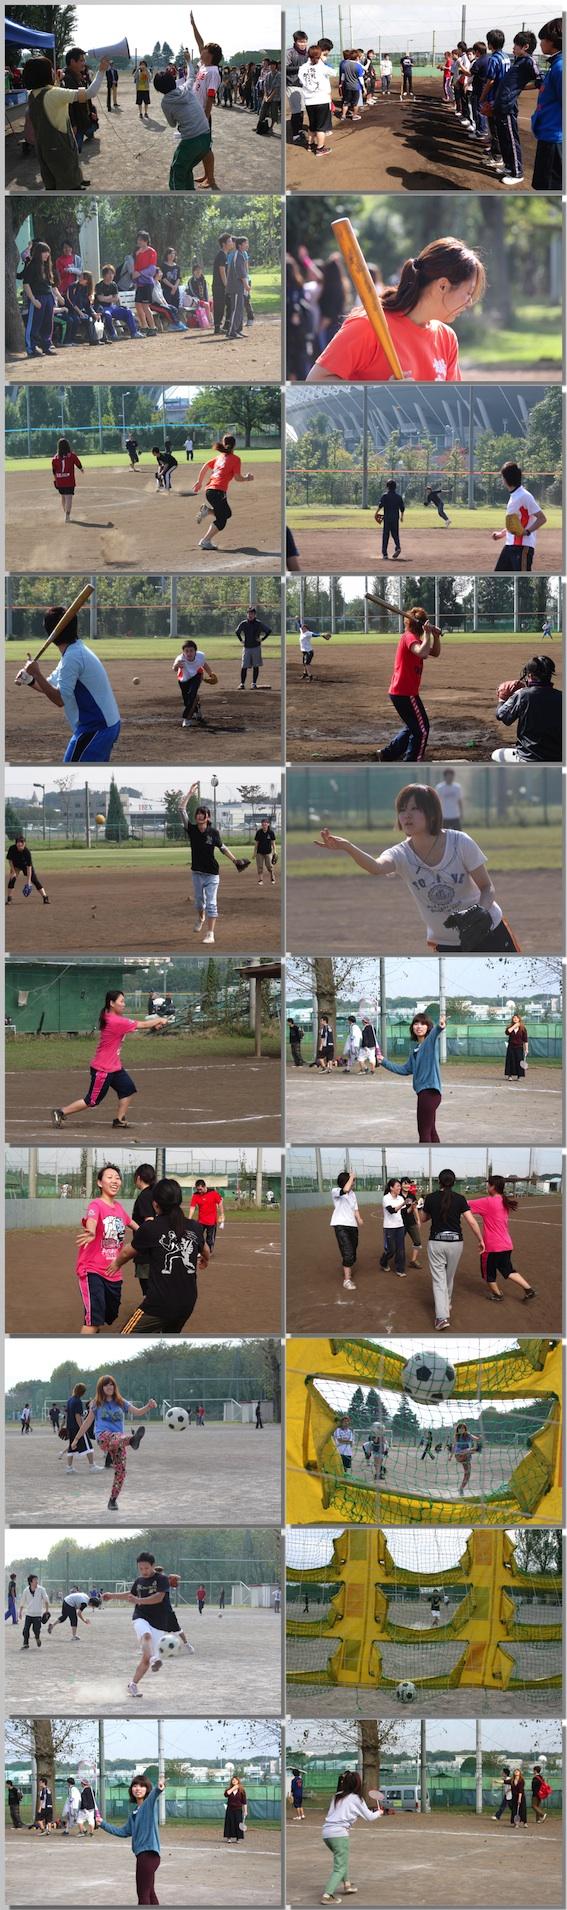 2012sports01s